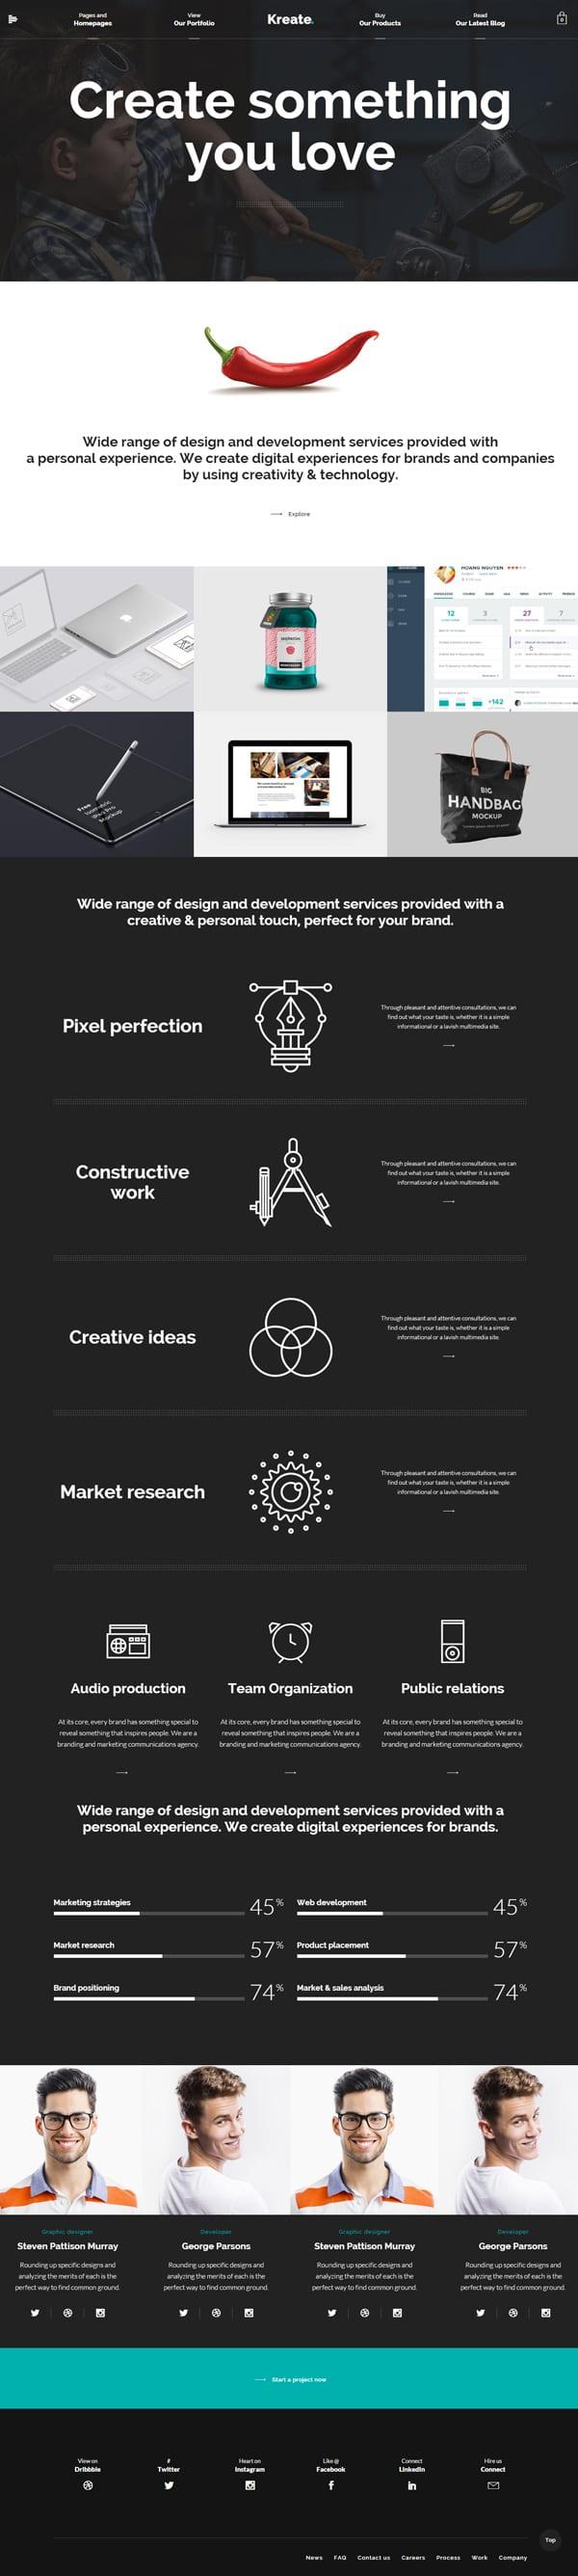 kreate-expert-theme-for-creative-business